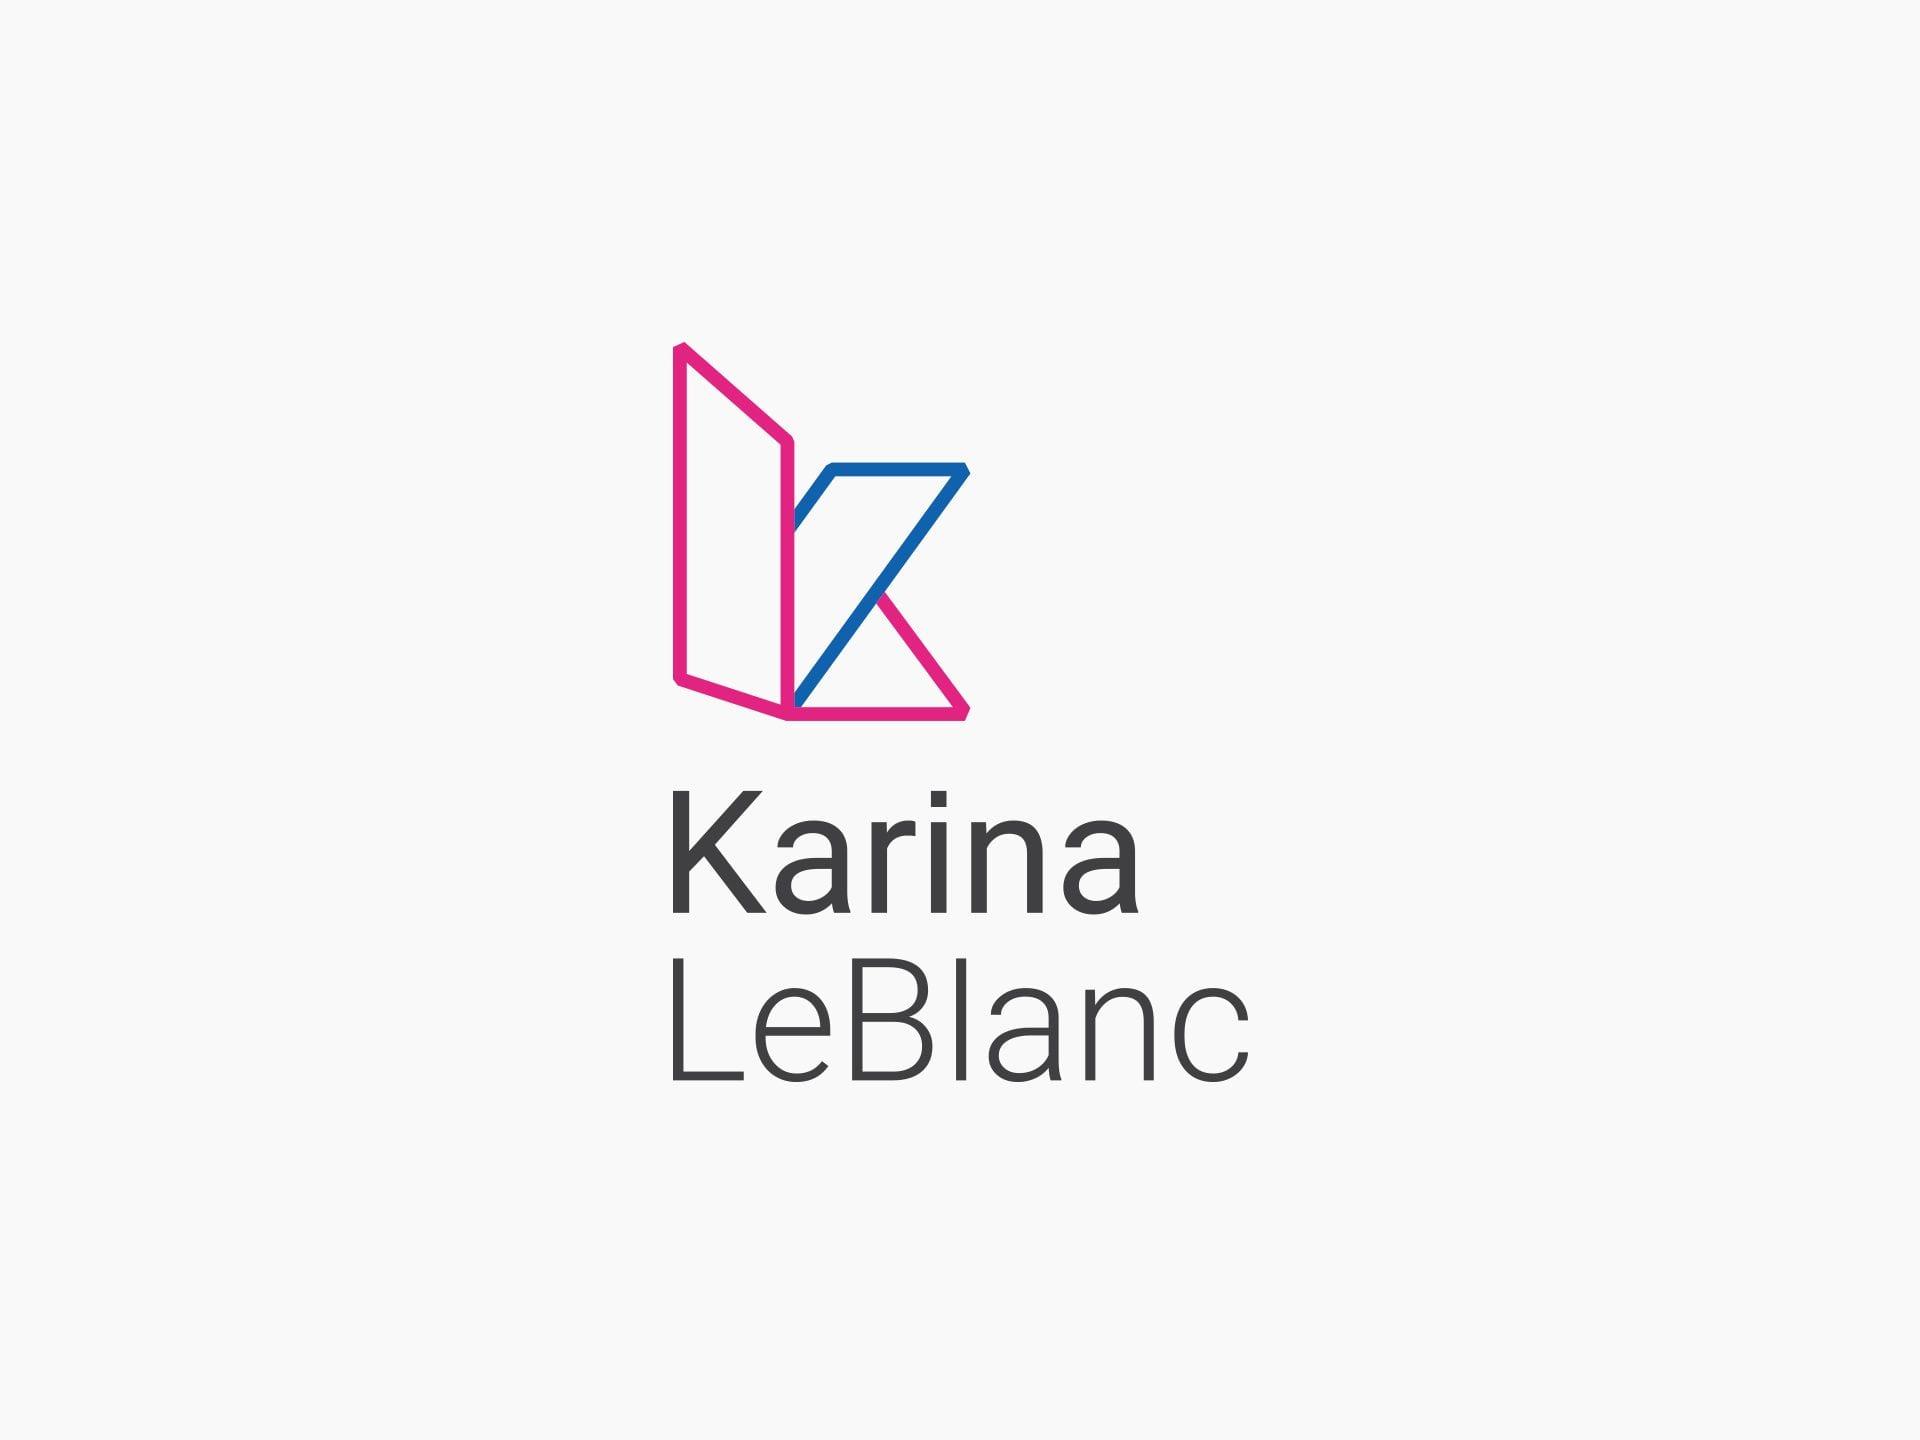 Y5 Creative Case Studies Karina LeBlanc Logo 2019